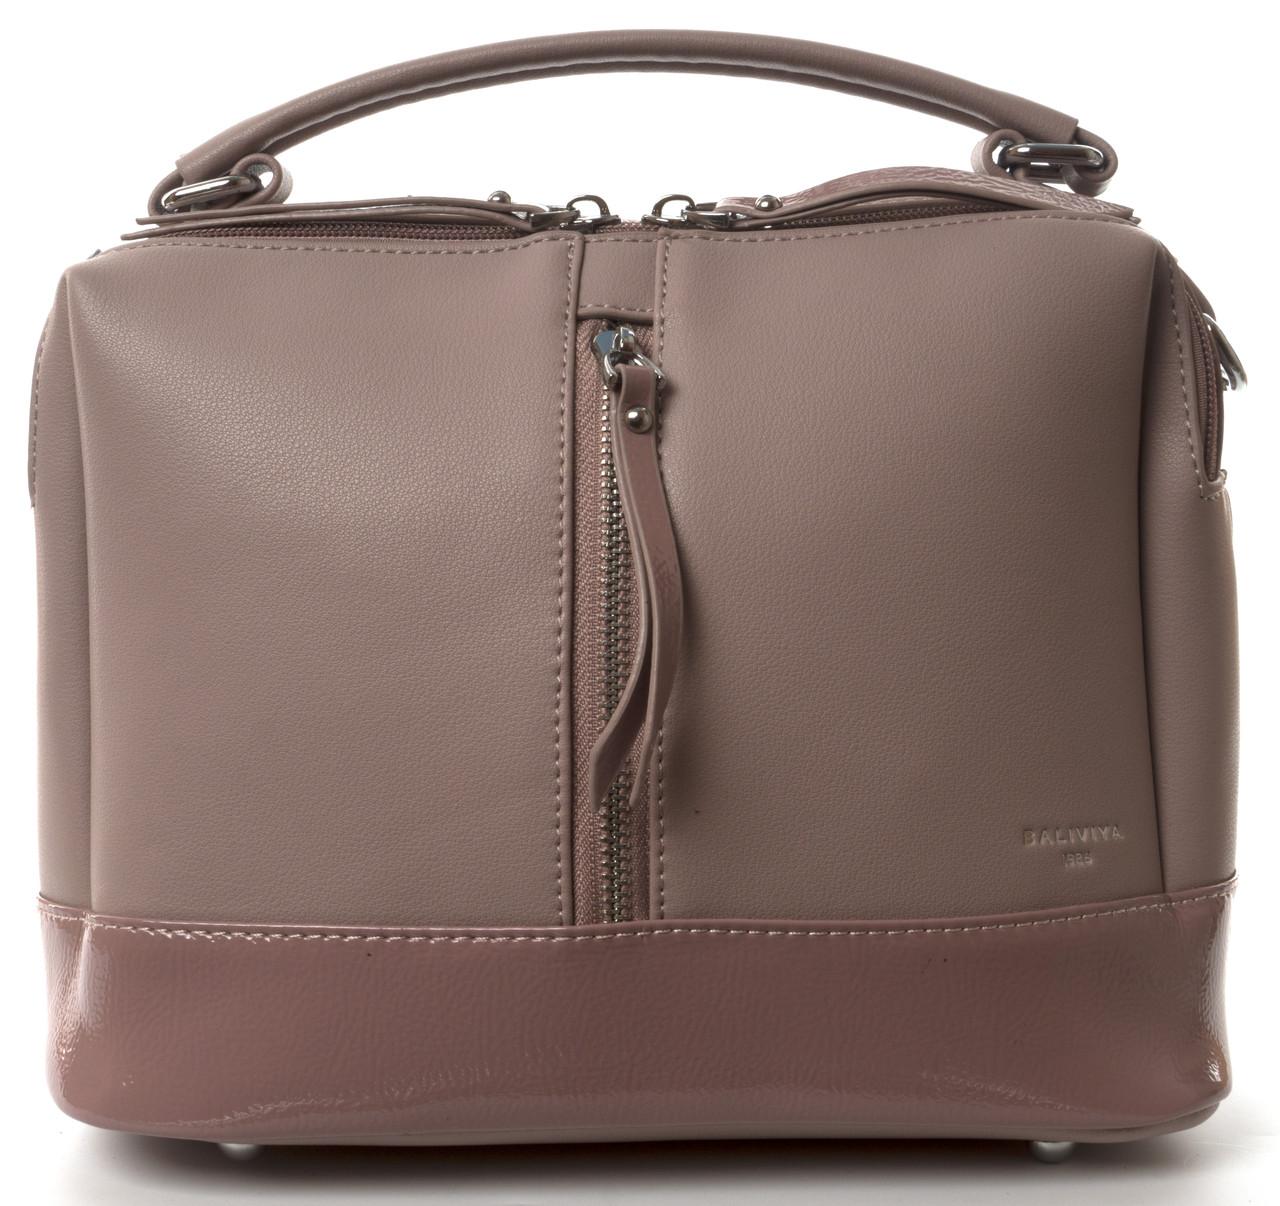 Удобная надежная стильная прочная женская сумка BALIVIYA art. 19397